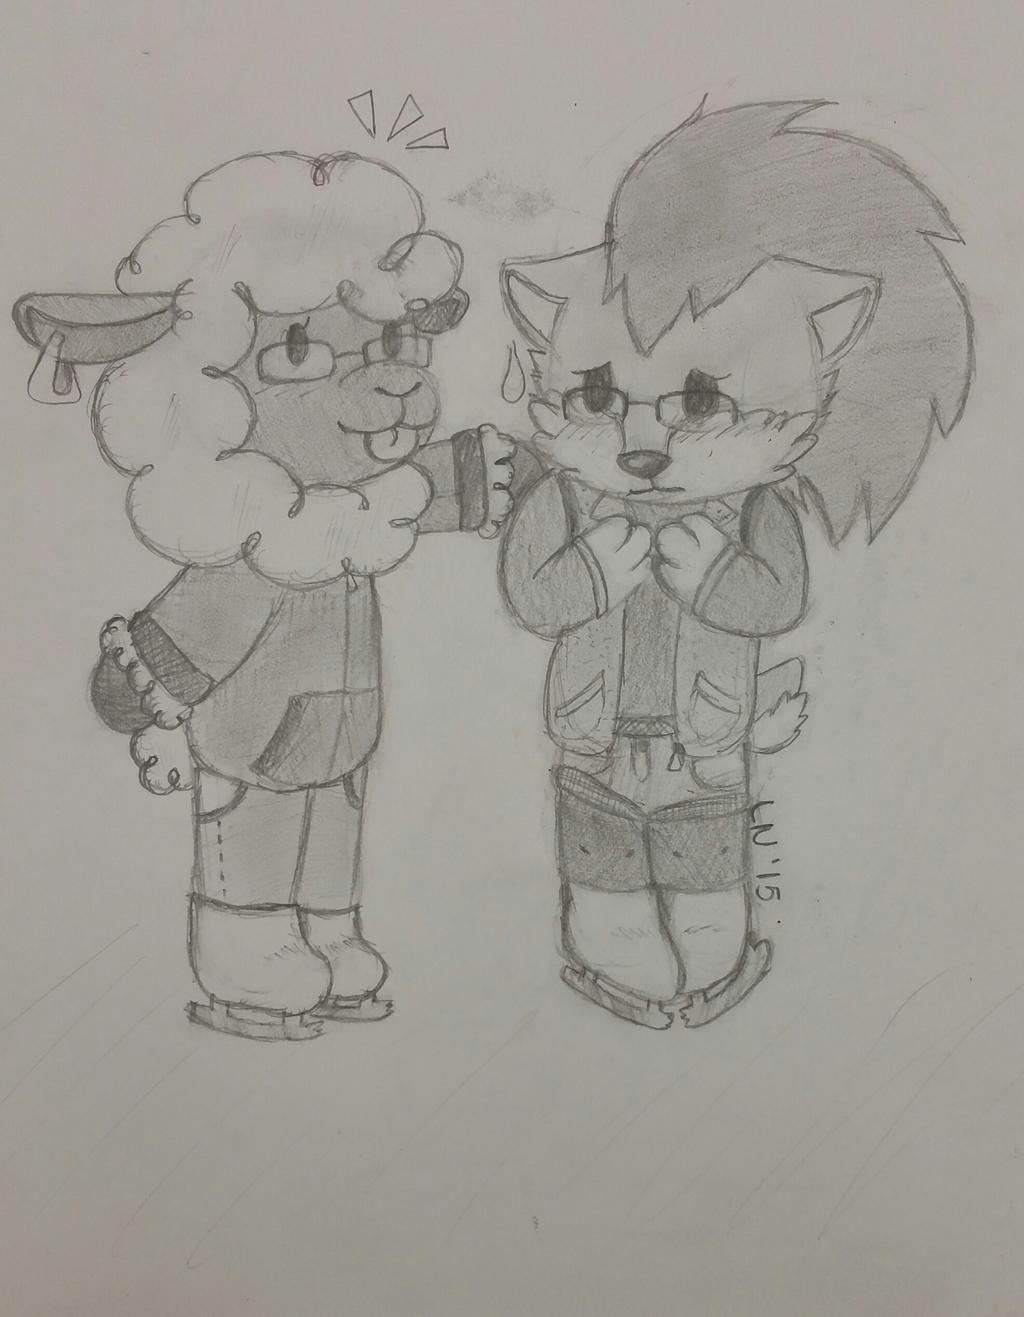 Sheepy and Sugar on Ice